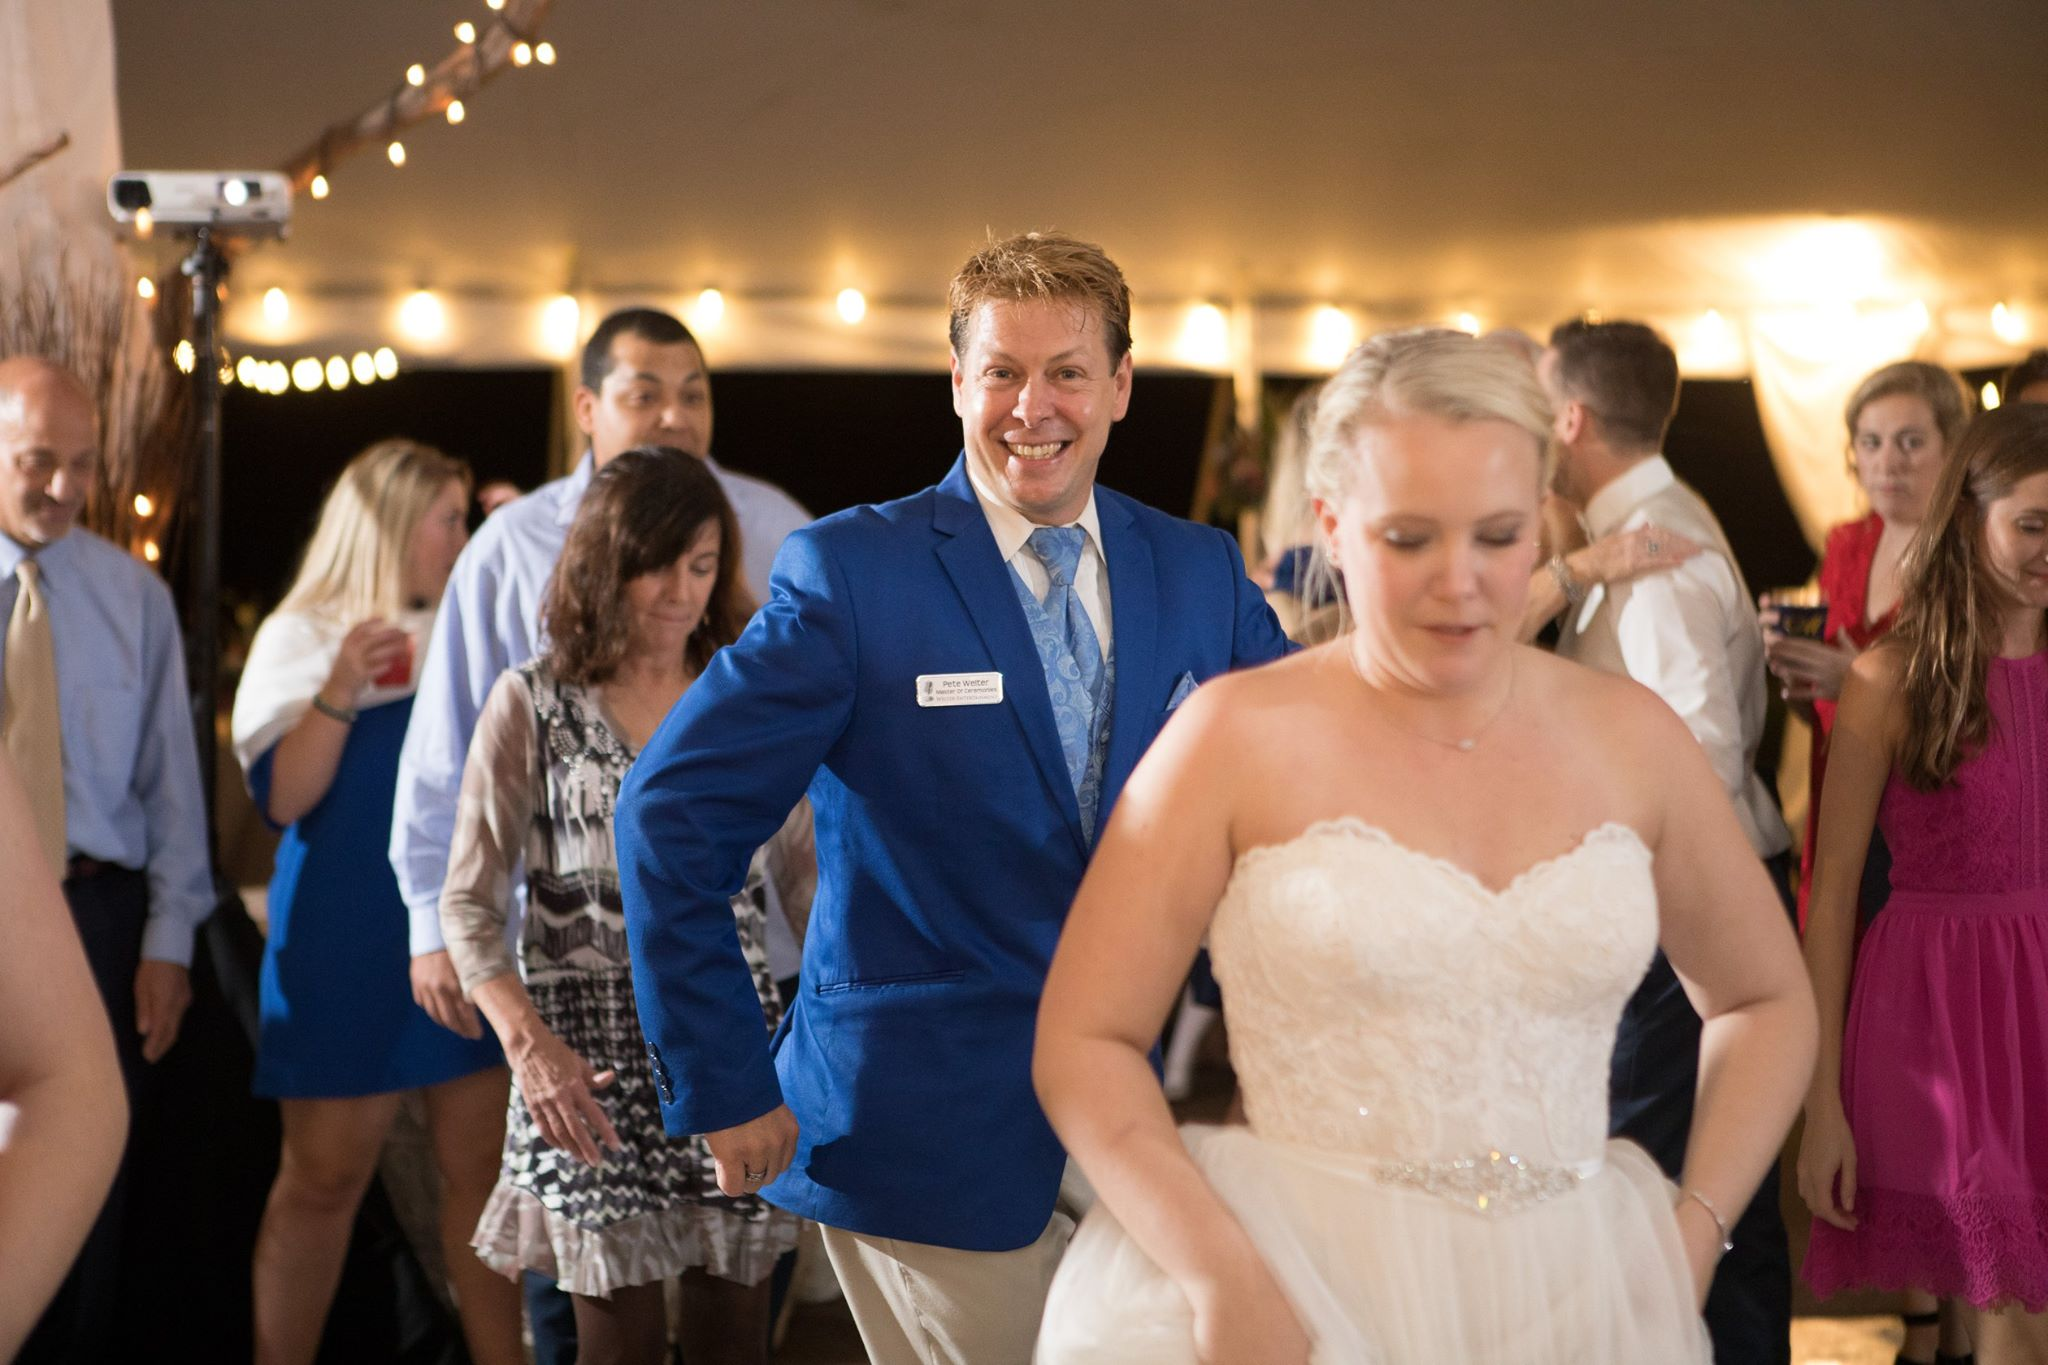 McSherry Dancing